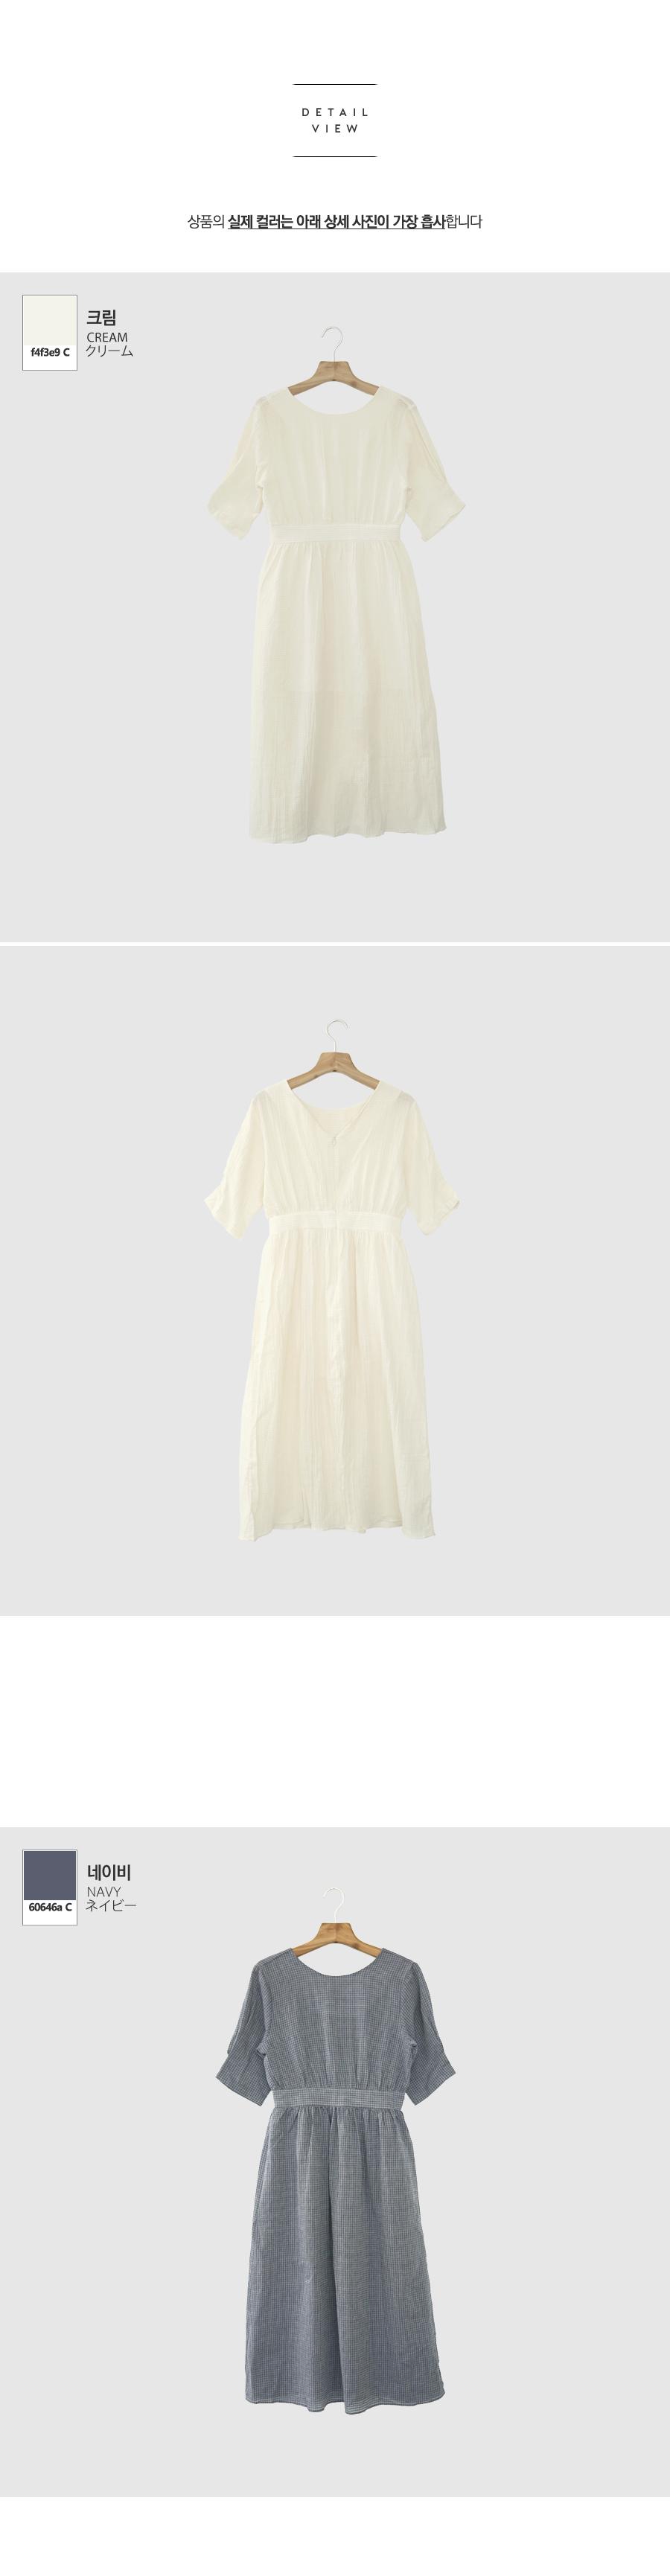 Waistline Cup Check Dress